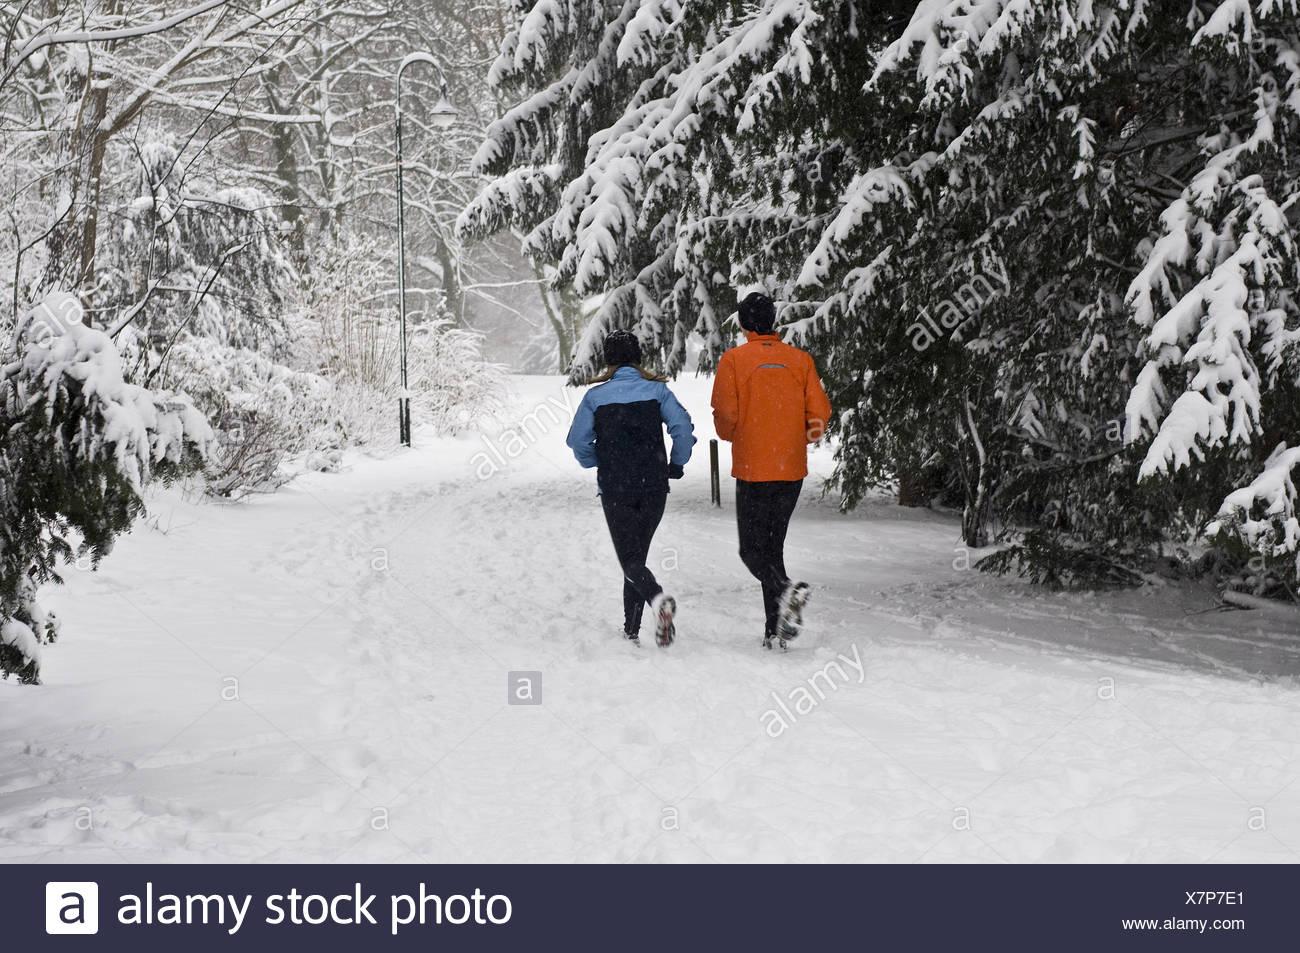 jogging in winter - Stock Image